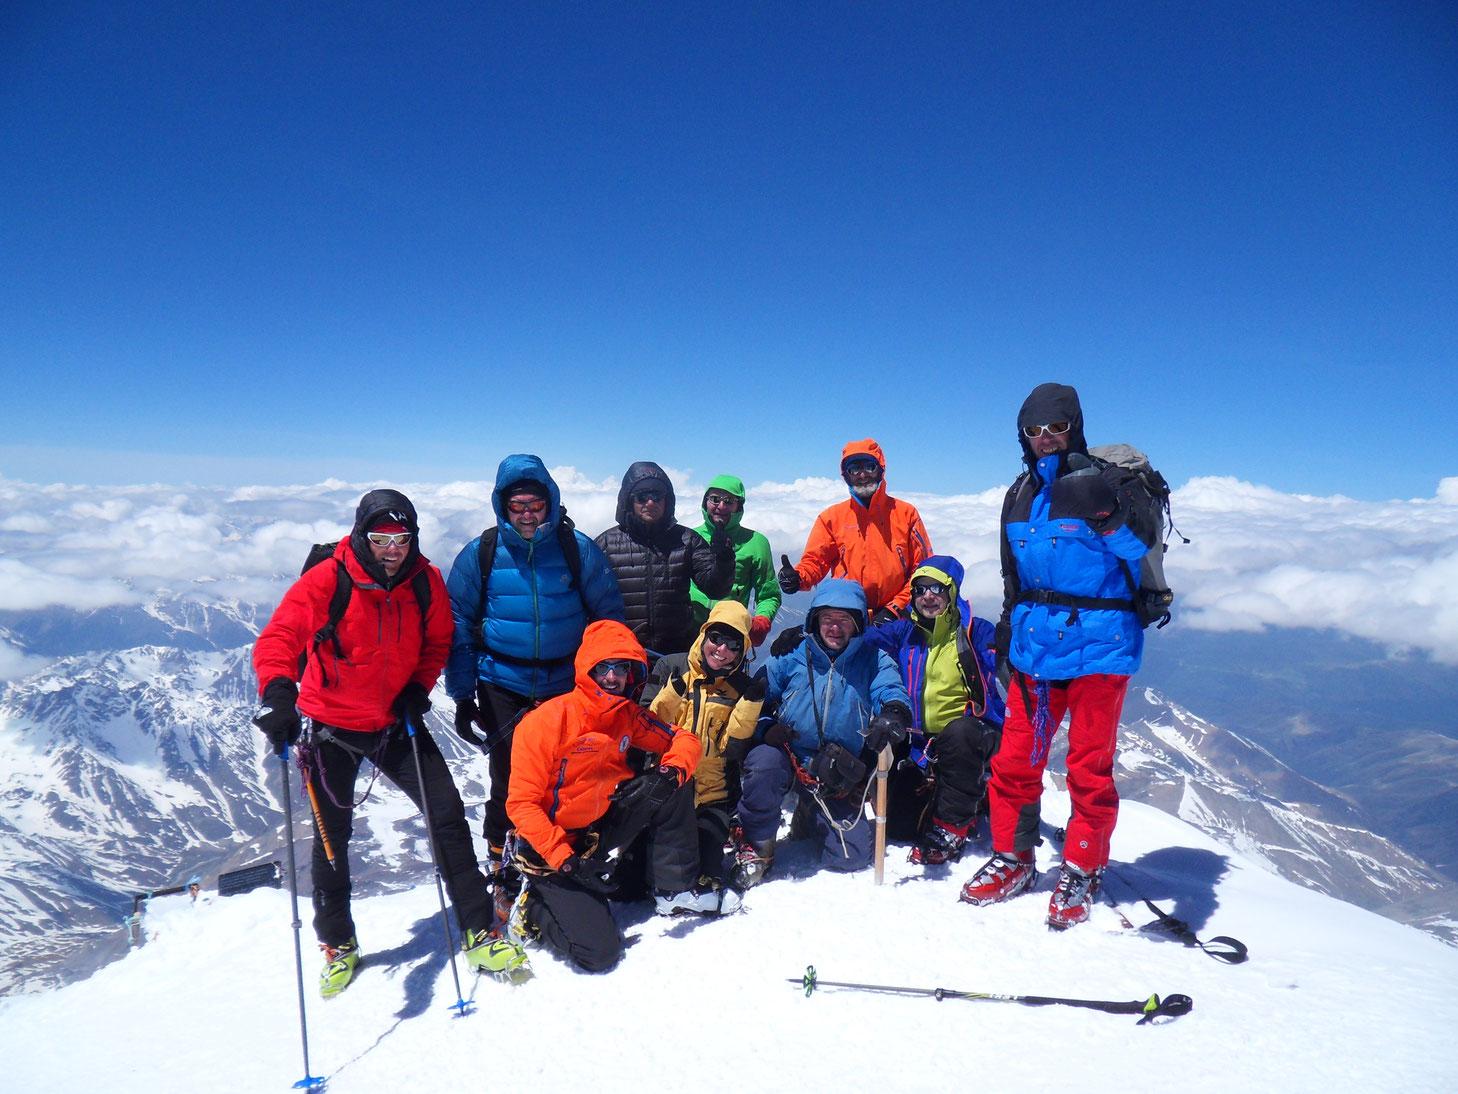 Sondertermin Elbrus Besteigung SA 21.08.2021 bis SO 29.08.2021